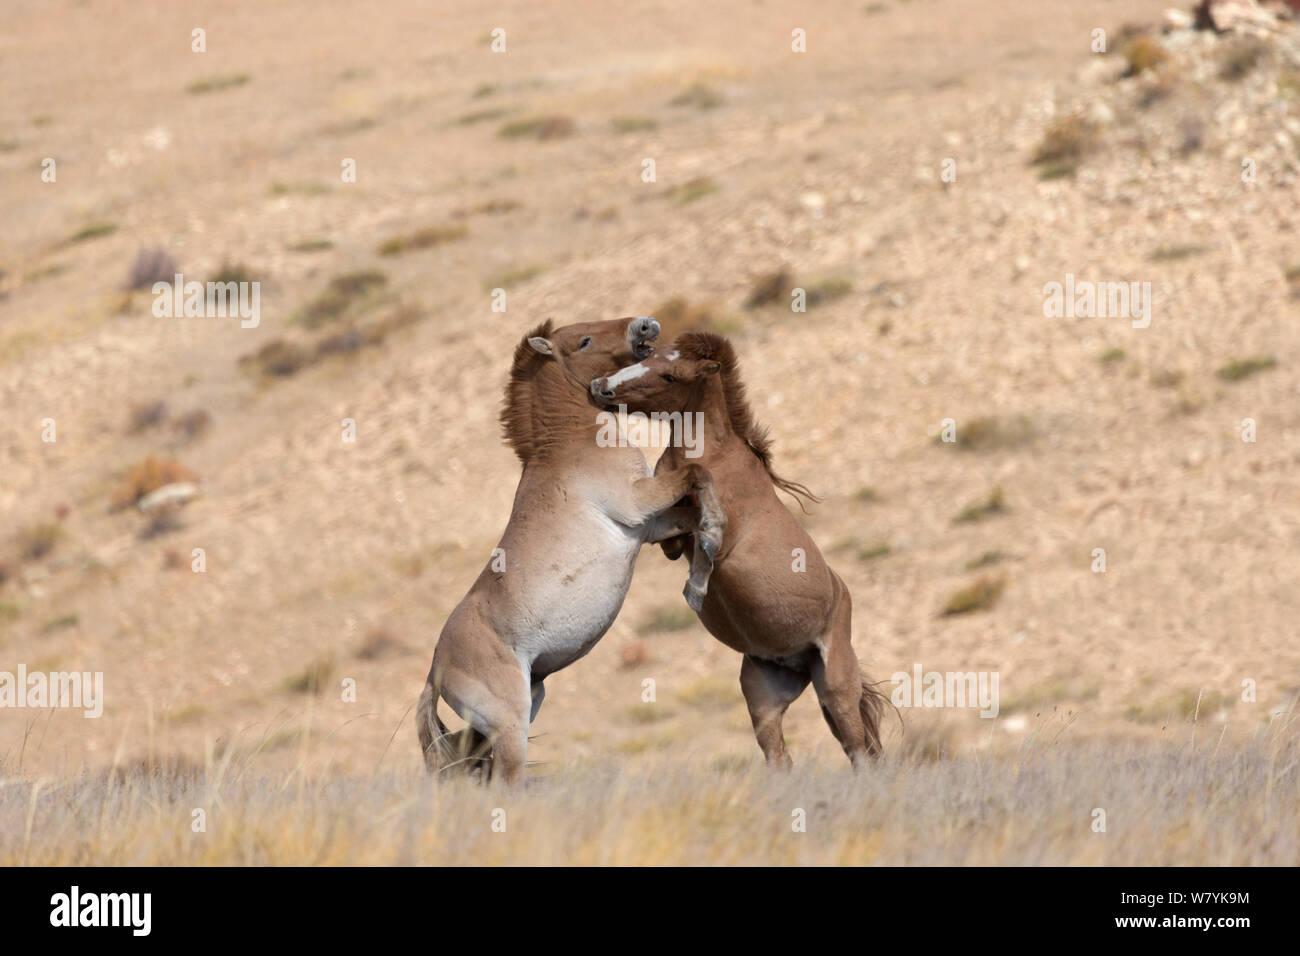 Two wild Przewalski / Takhi Horse (Equus ferus przewalskii) bachelor stallions play fighting, Hustai National Park, Tuv Province, Mongolia. Endangered species. September. Stock Photo